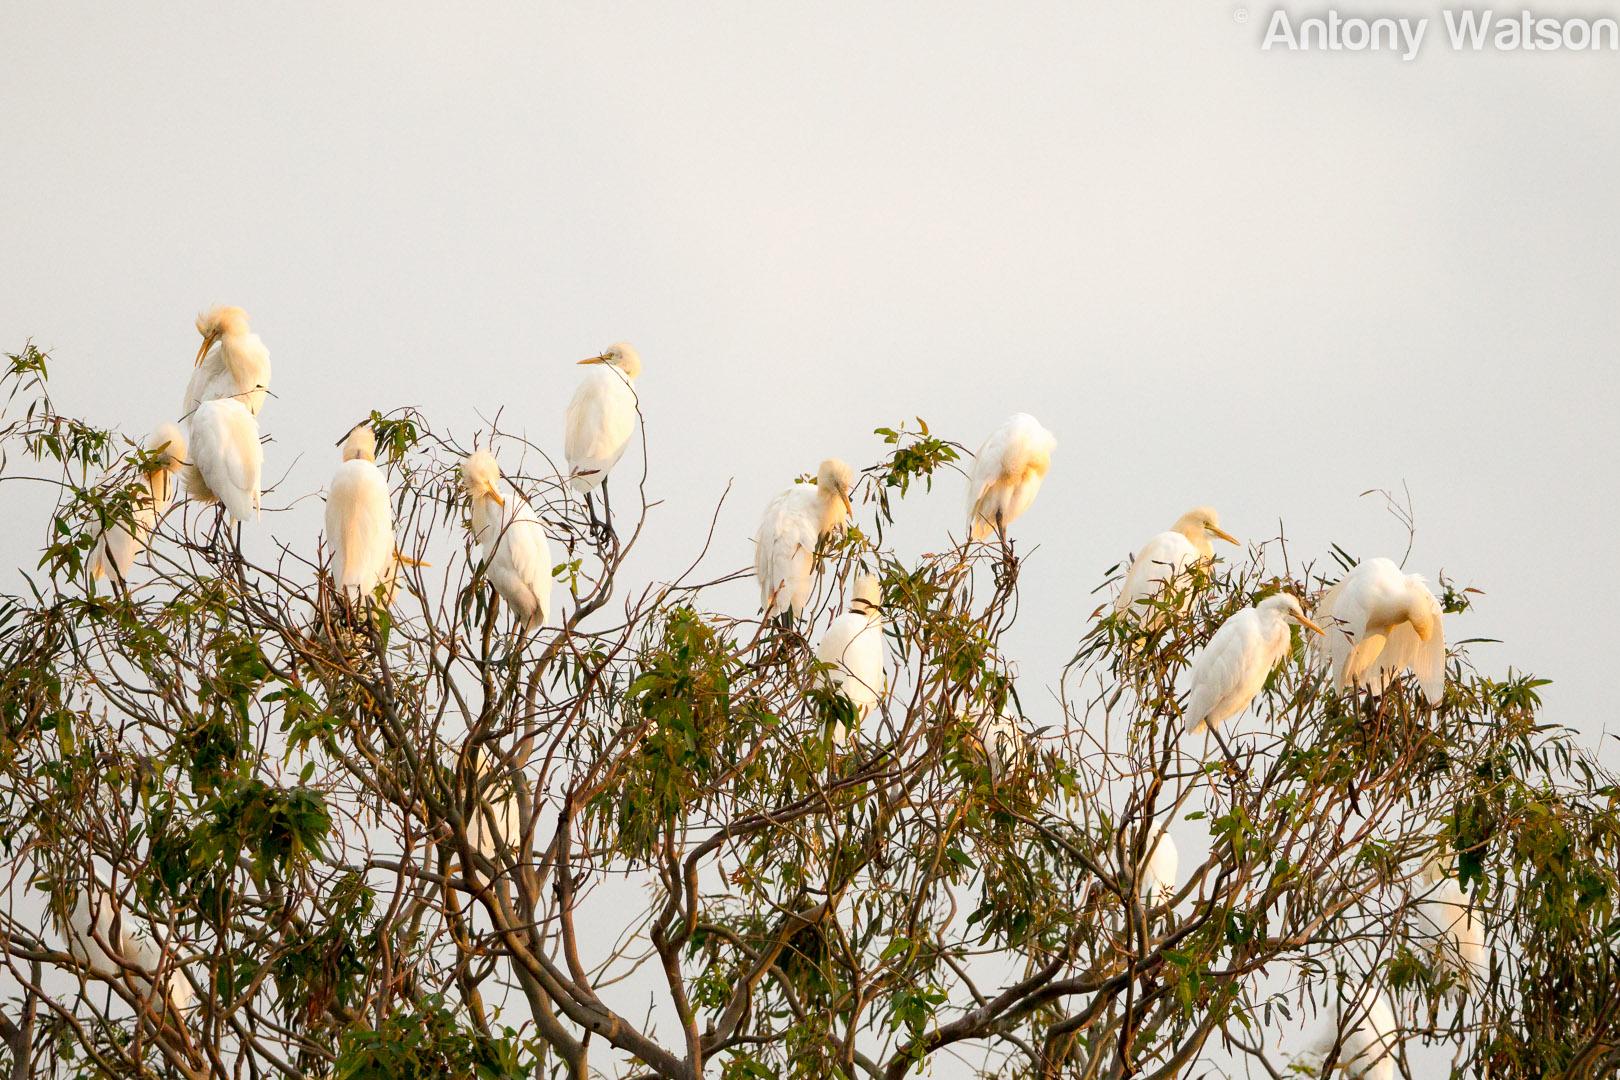 Birding-7985